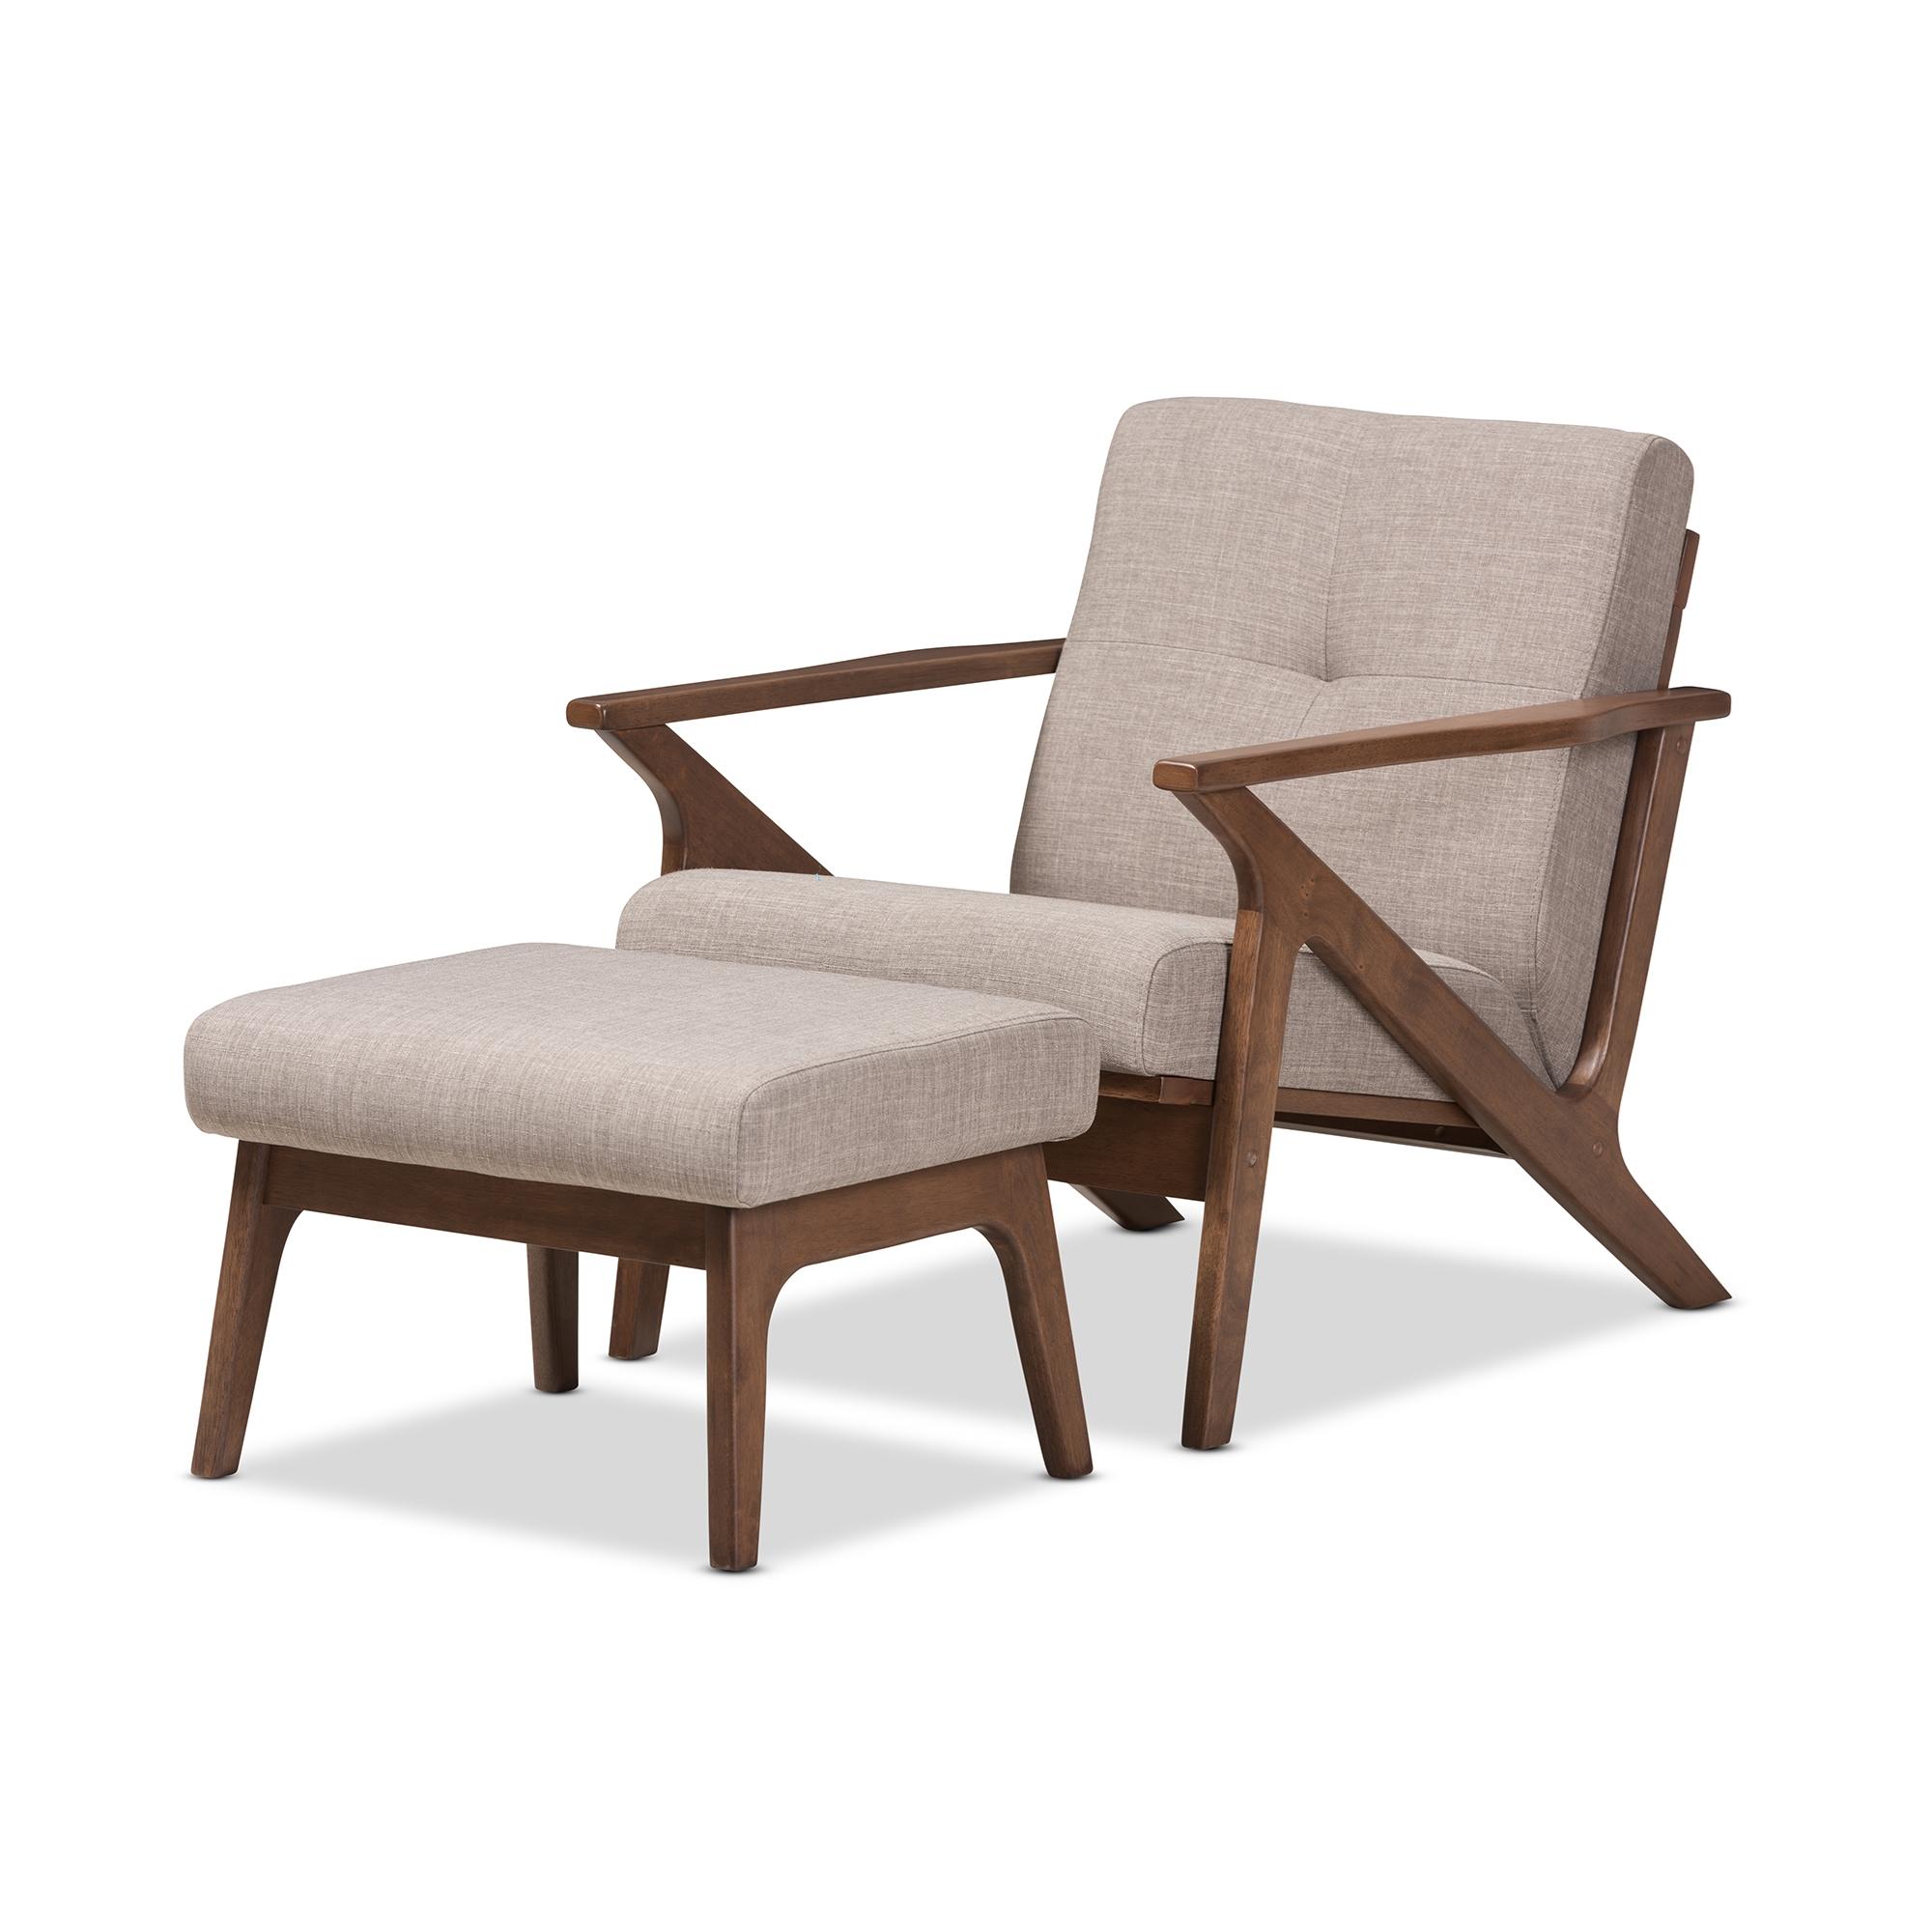 Wondrous Baxton Studio Bianca Mid Century Modern Walnut Wood Light Uwap Interior Chair Design Uwaporg